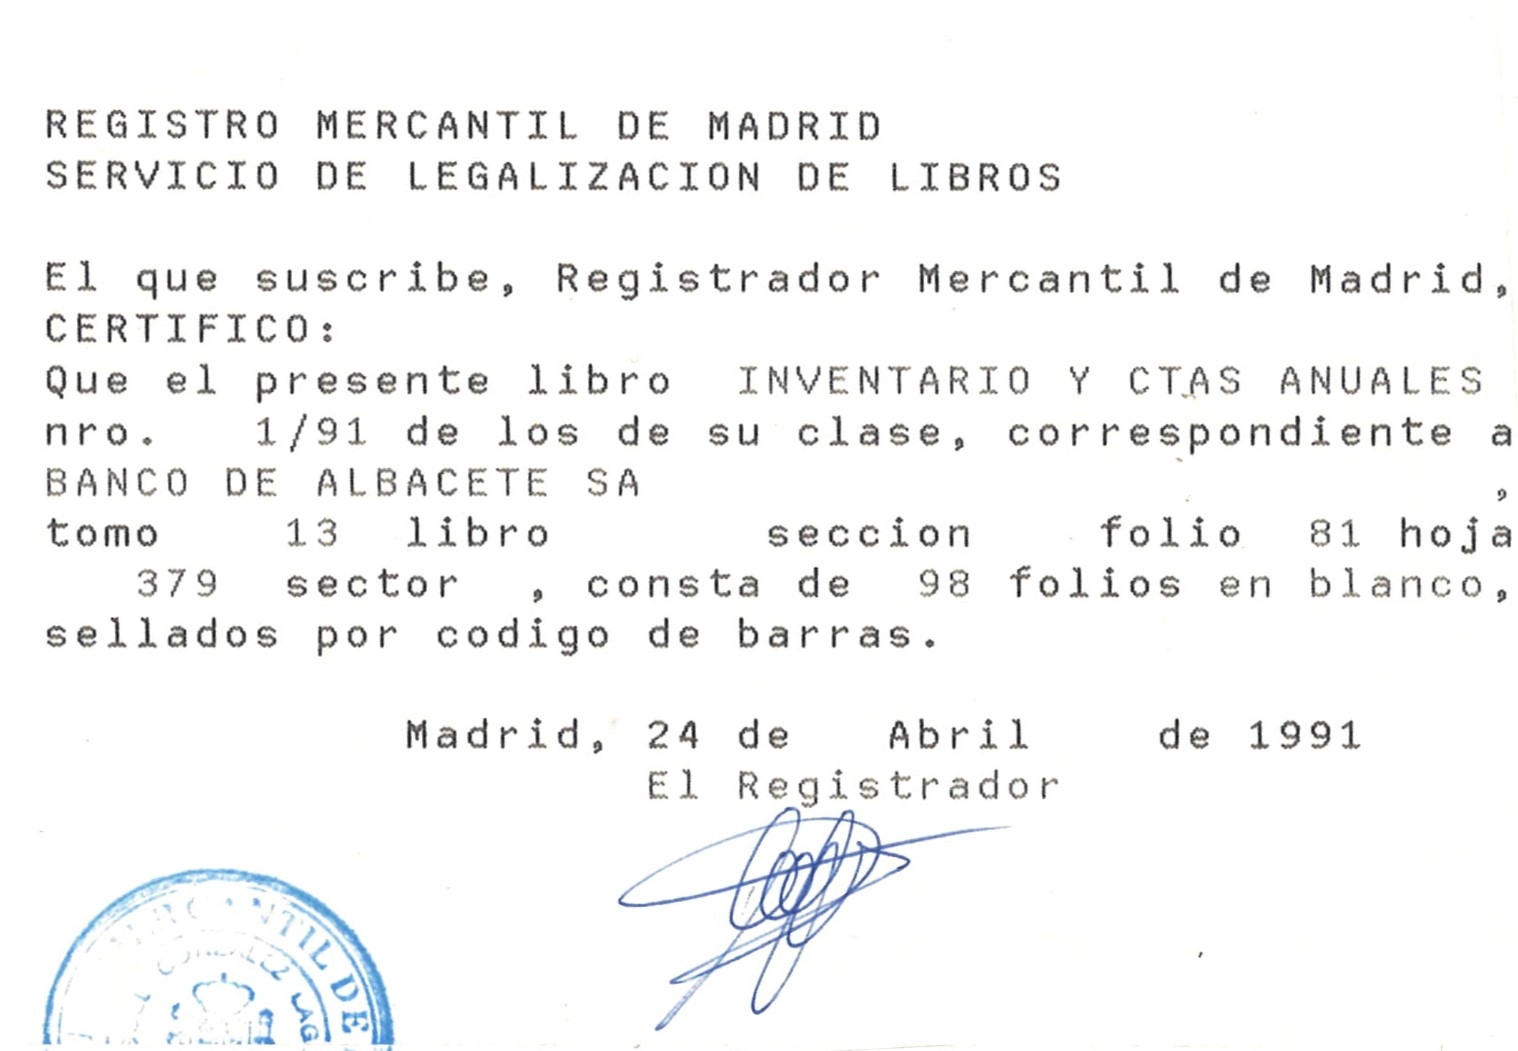 Banco de Albacete